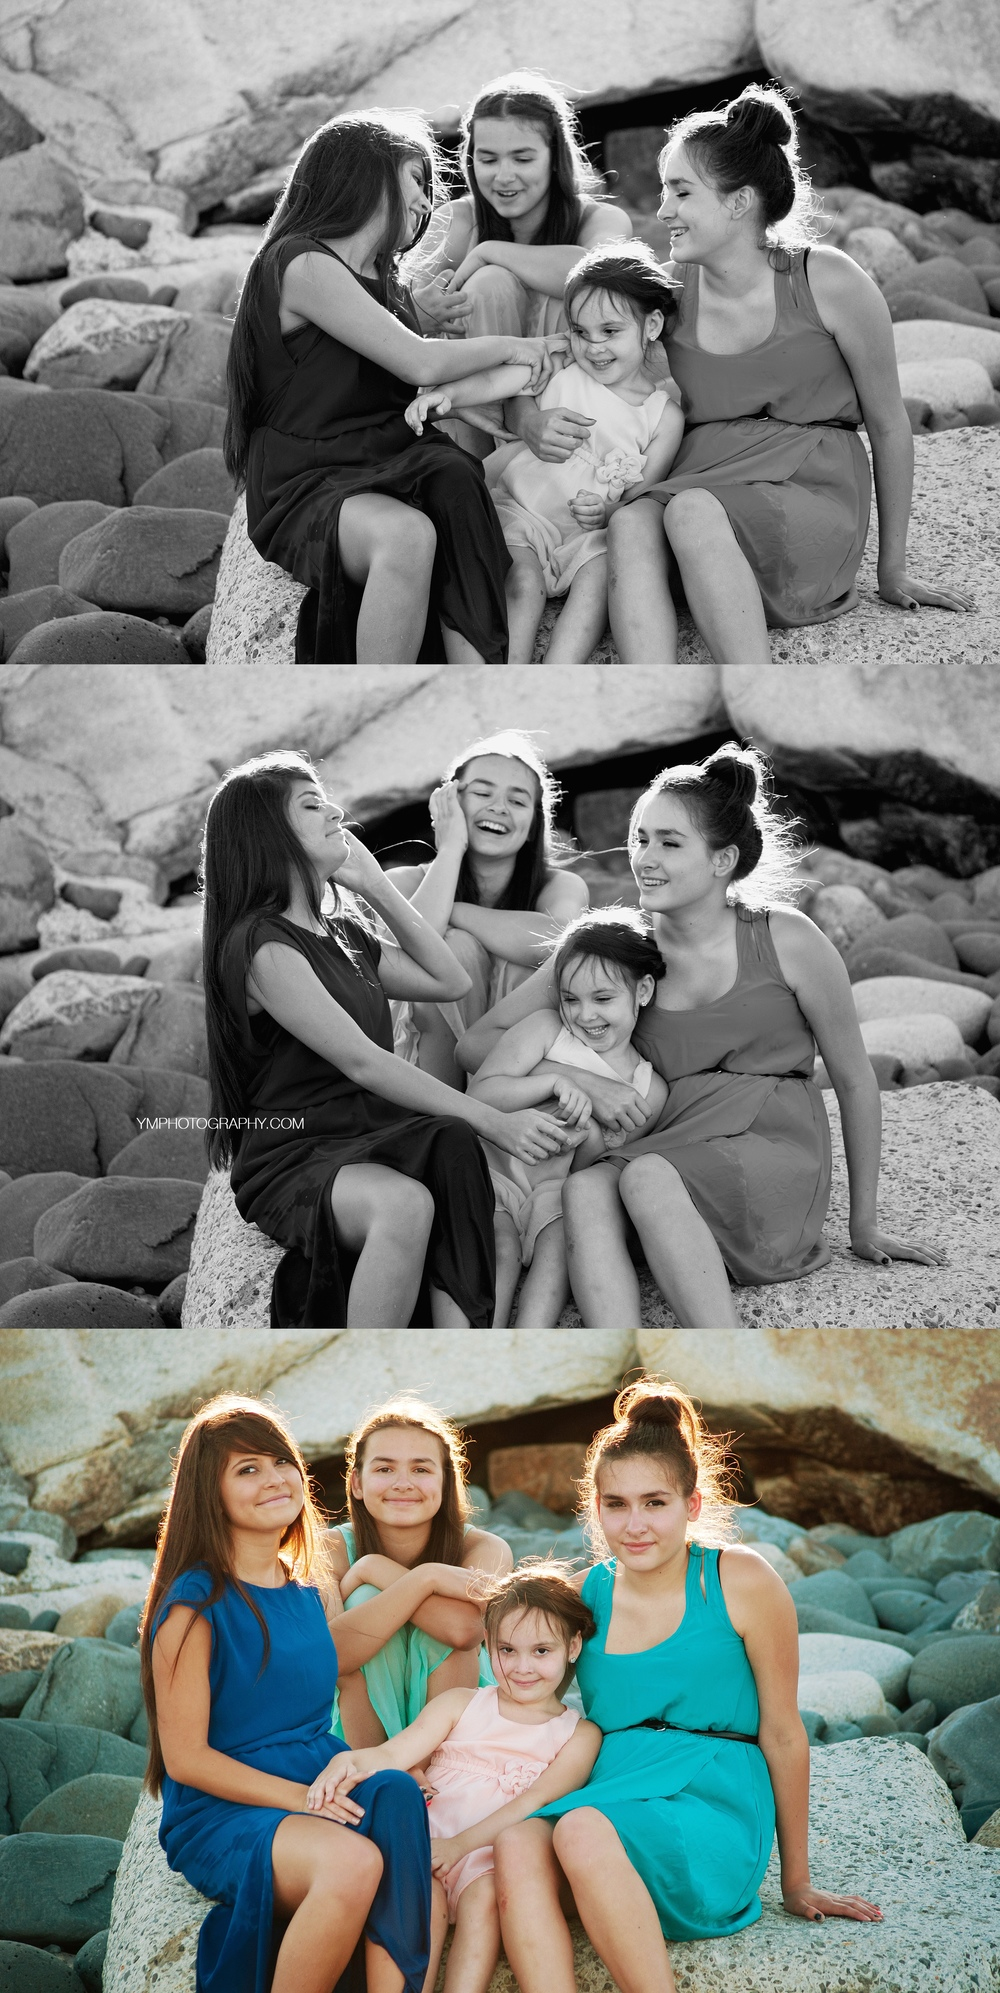 2013 Family Portrait © ymphotography 2015 www.ymphotography.com